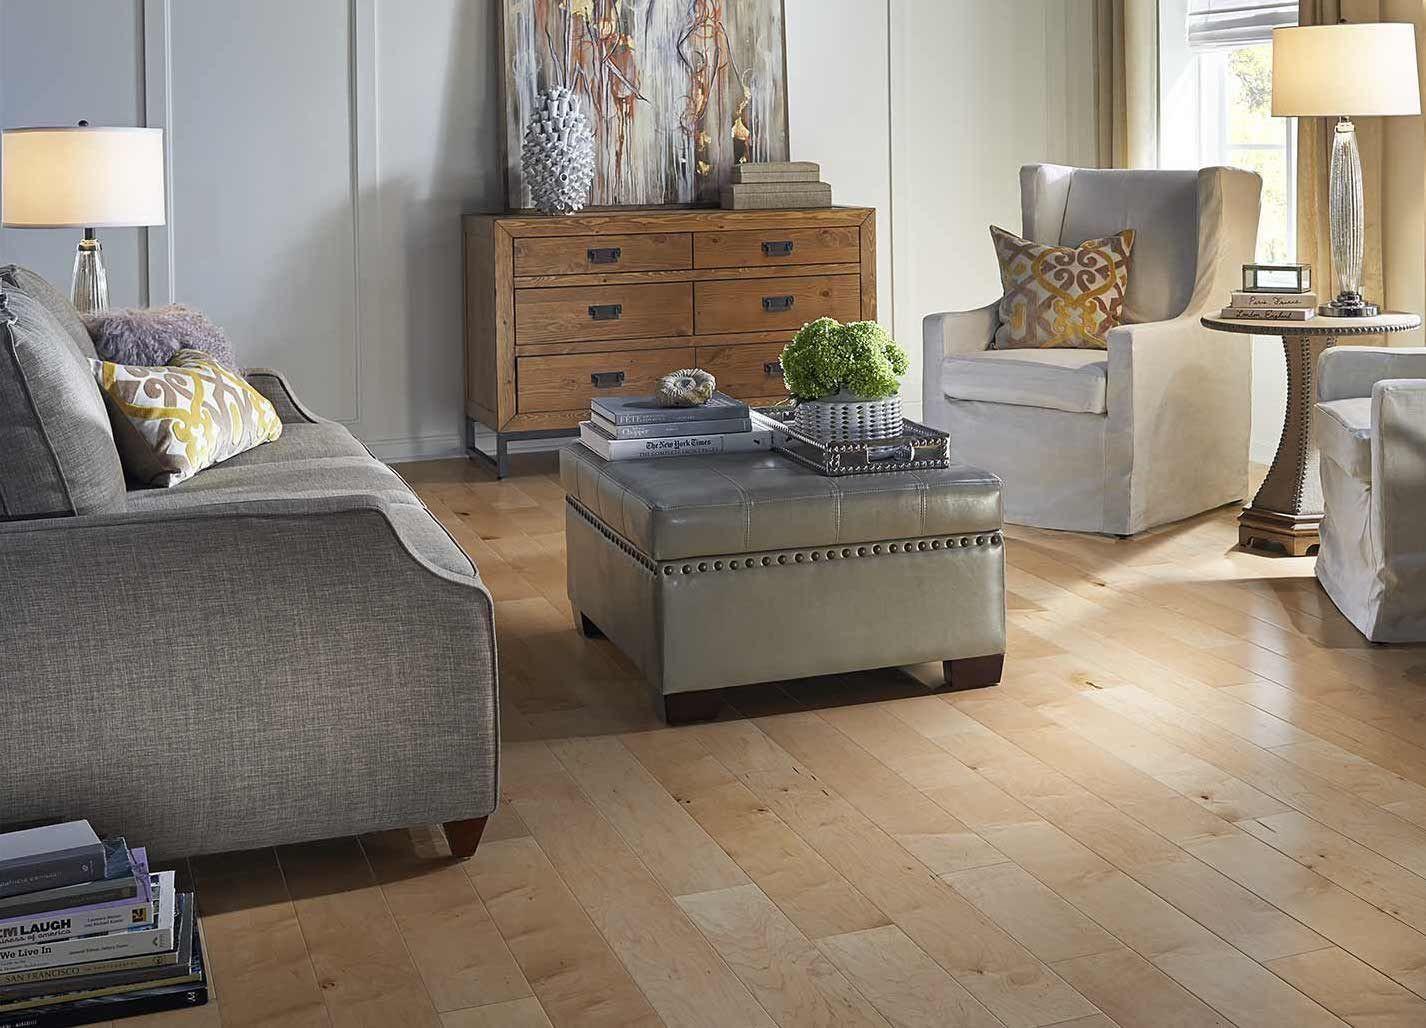 maple hardwood flooring ottawa of the natural pale blonde hues of this maple hardwood floor is inside the natural pale blonde hues of this maple hardwood floor is complemented by contrasting darker